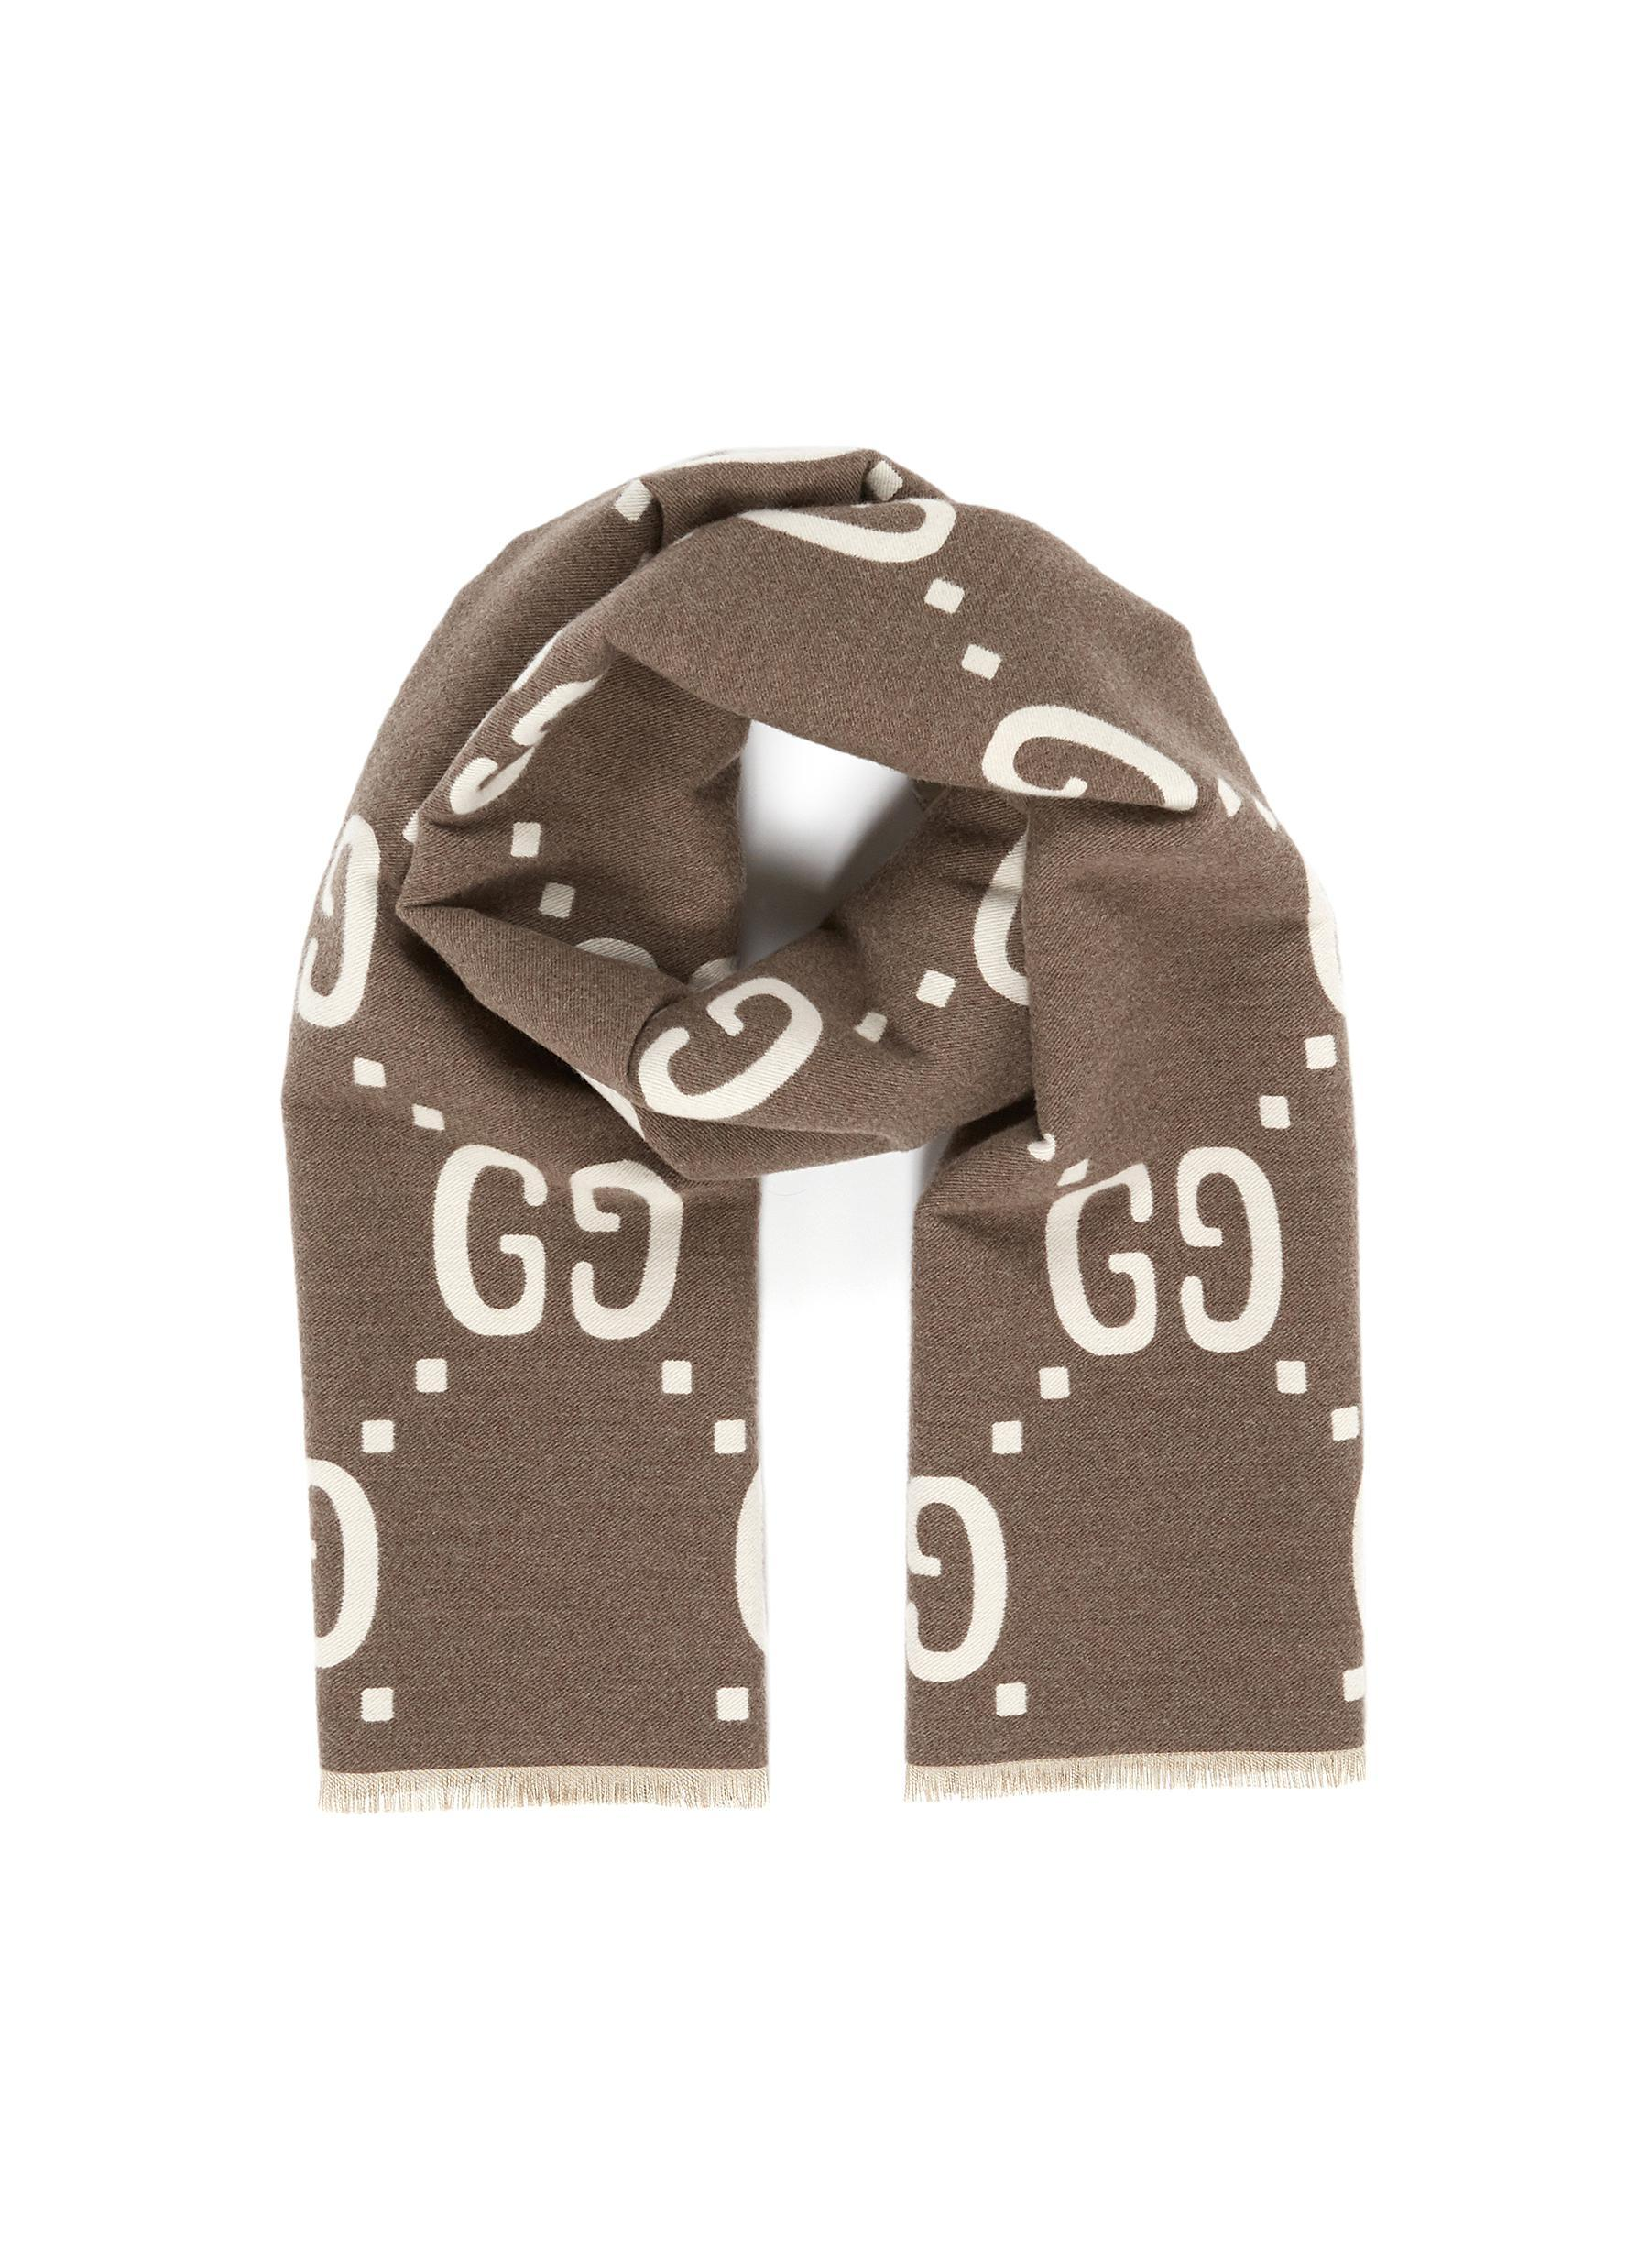 5e0617d0326 Gucci. Women s Reversible GG Logo Jacquard Wool-silk Scarf